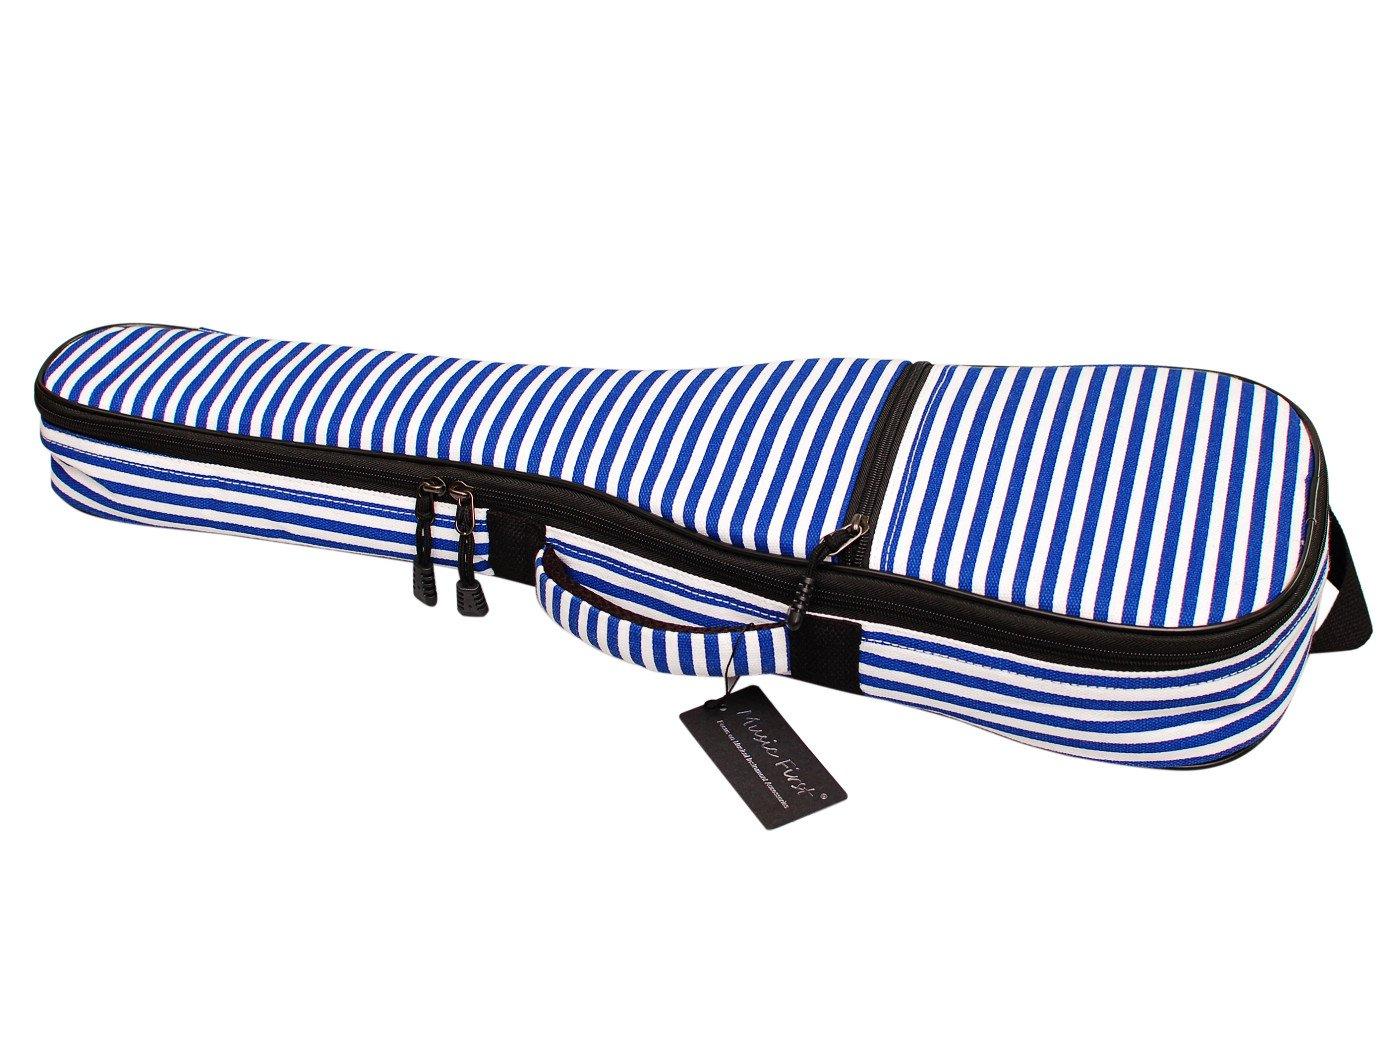 MUSIC FIRST Hand Portable 23'' Concert Cotton Canvas Blue Sailor's Striped Ukulele Bag Ukulele Cover Ukulele Case V2.0 by MUSIC FIRST (Image #4)